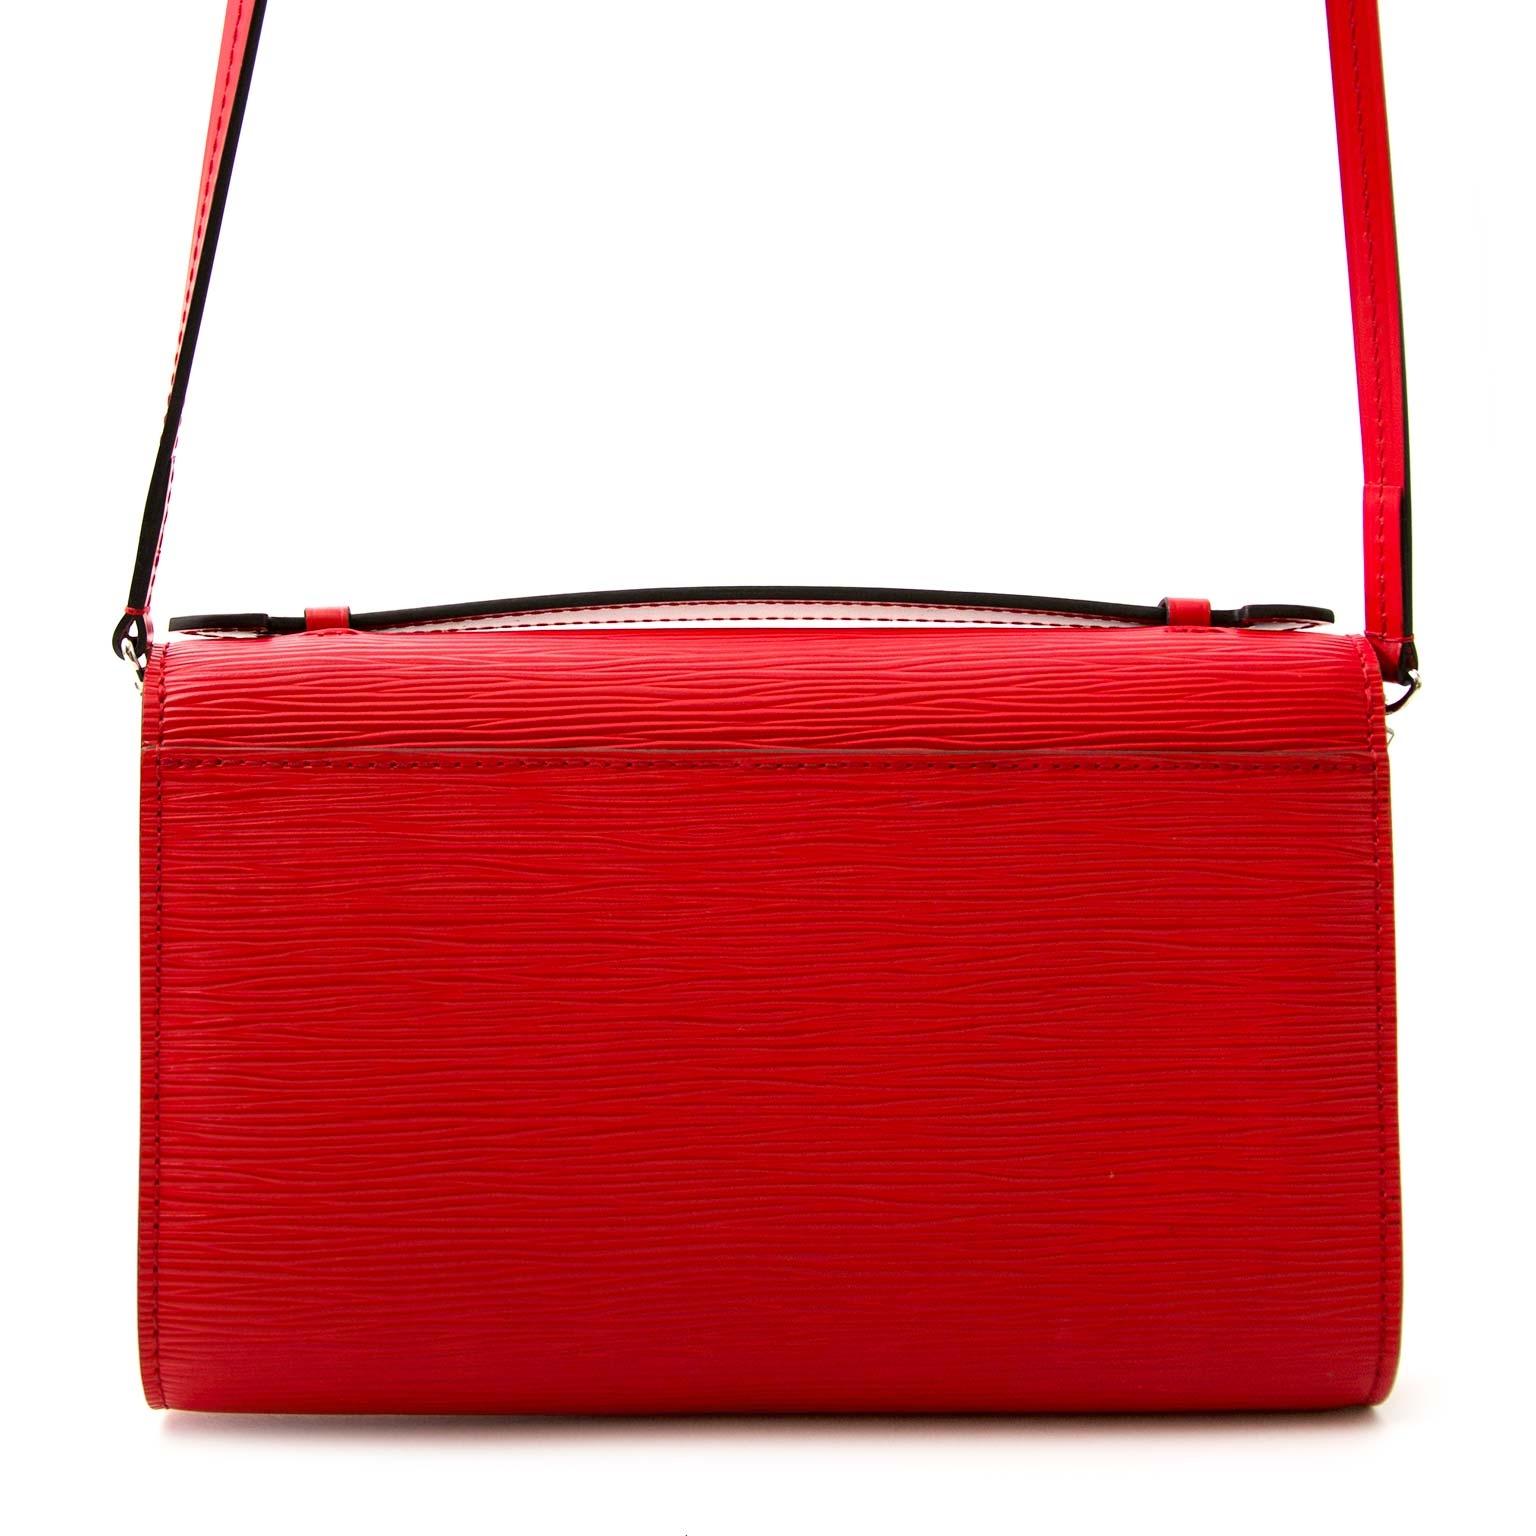 aac1a5ec0a09 ... skip the waitinglist shop safe online secondhand Louis Vuitton Clery  Epi Coquelicot + Strap + iPhone